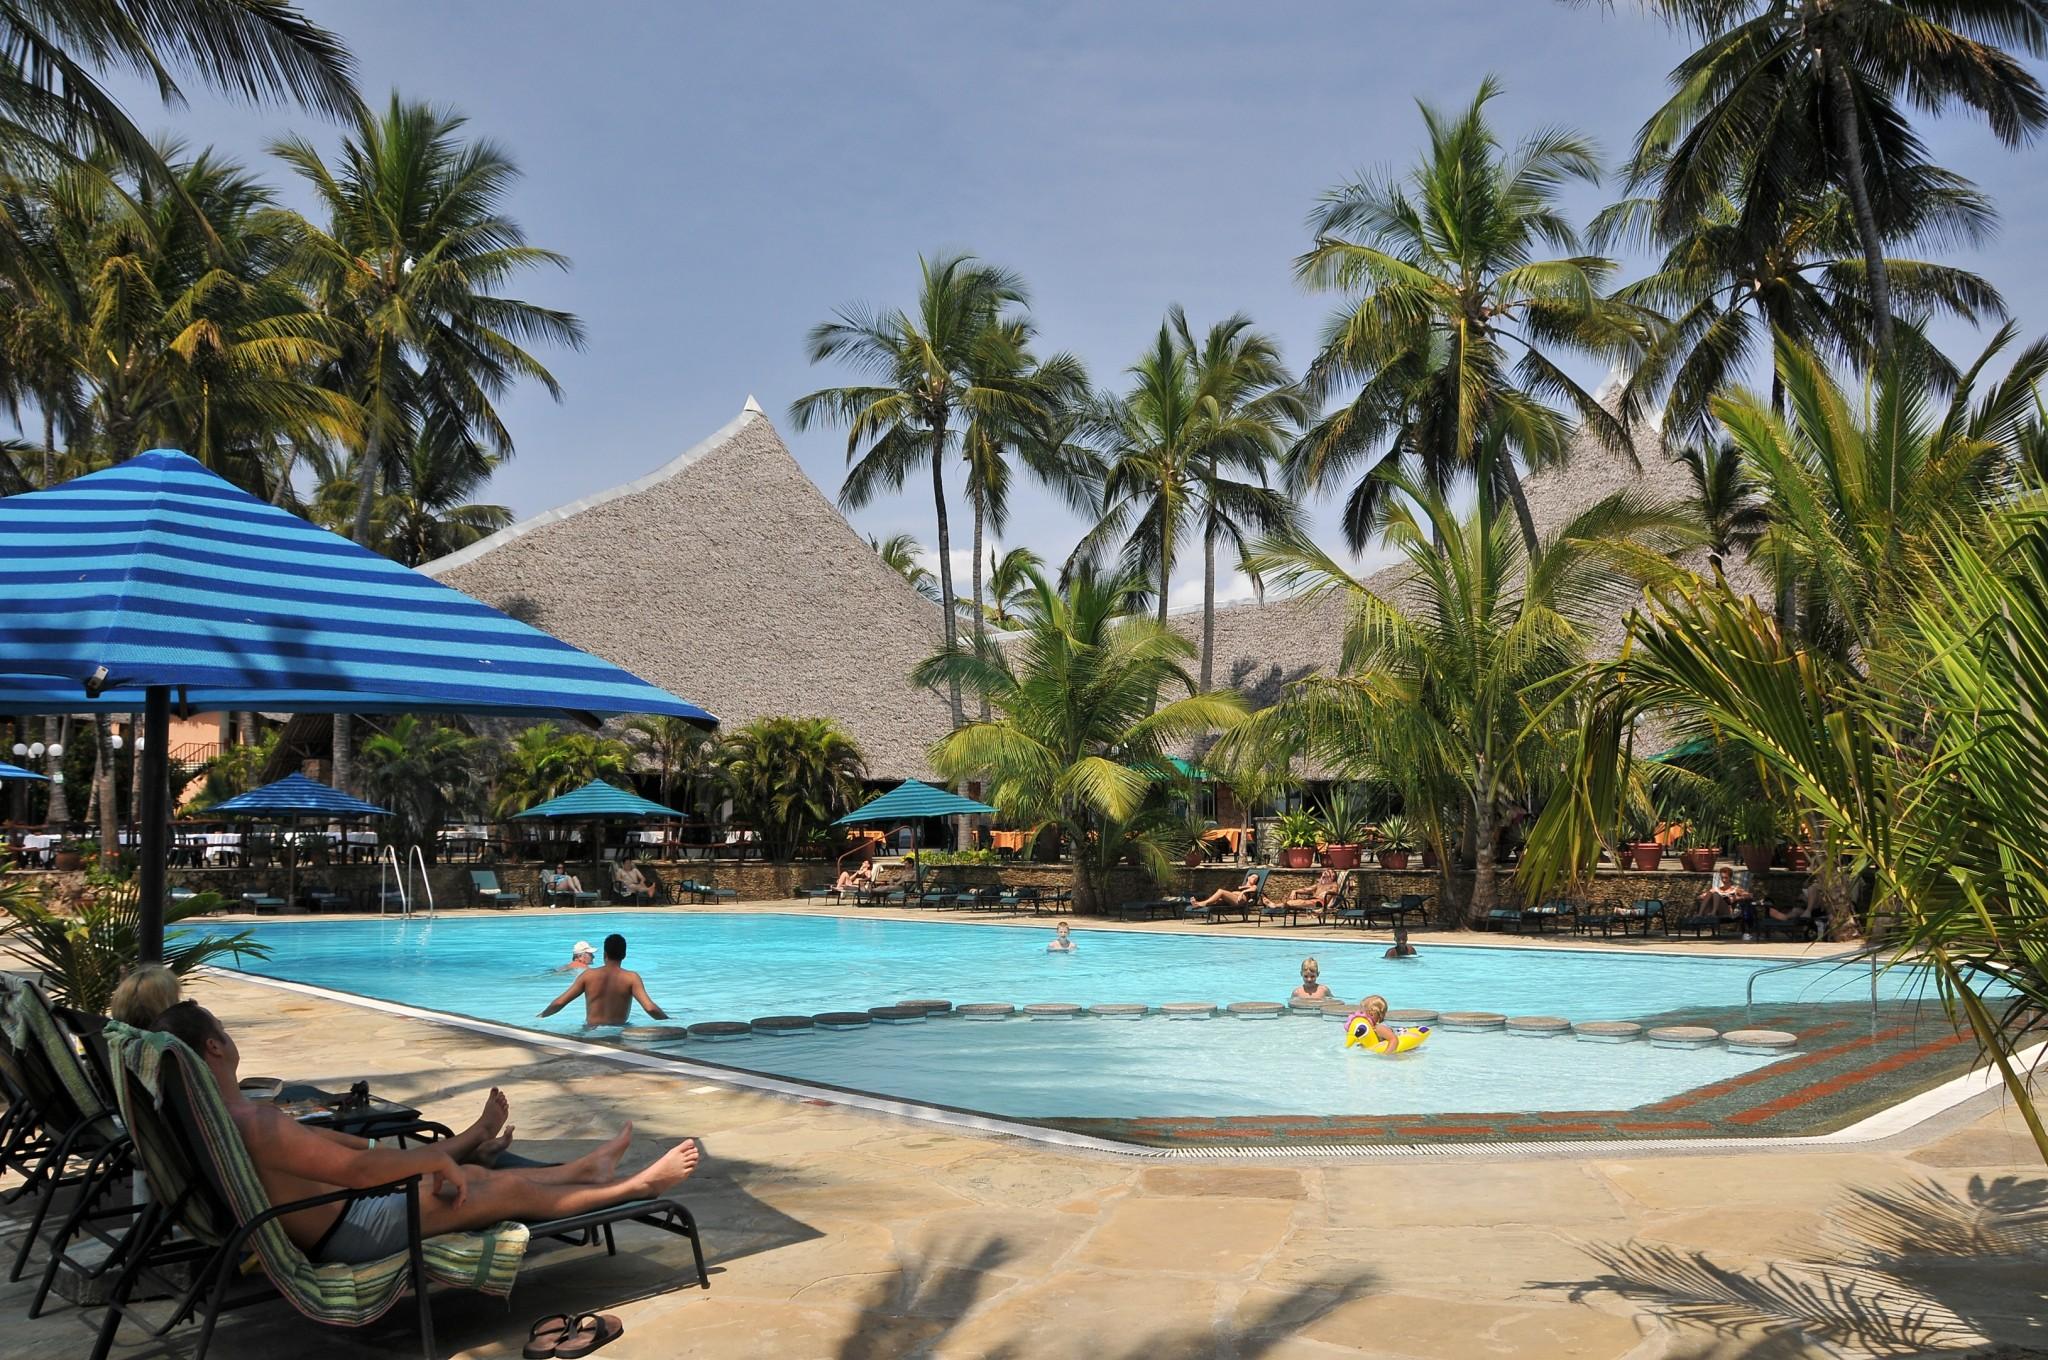 Bahari Beach Hotel Nyali Mombasa Kenia